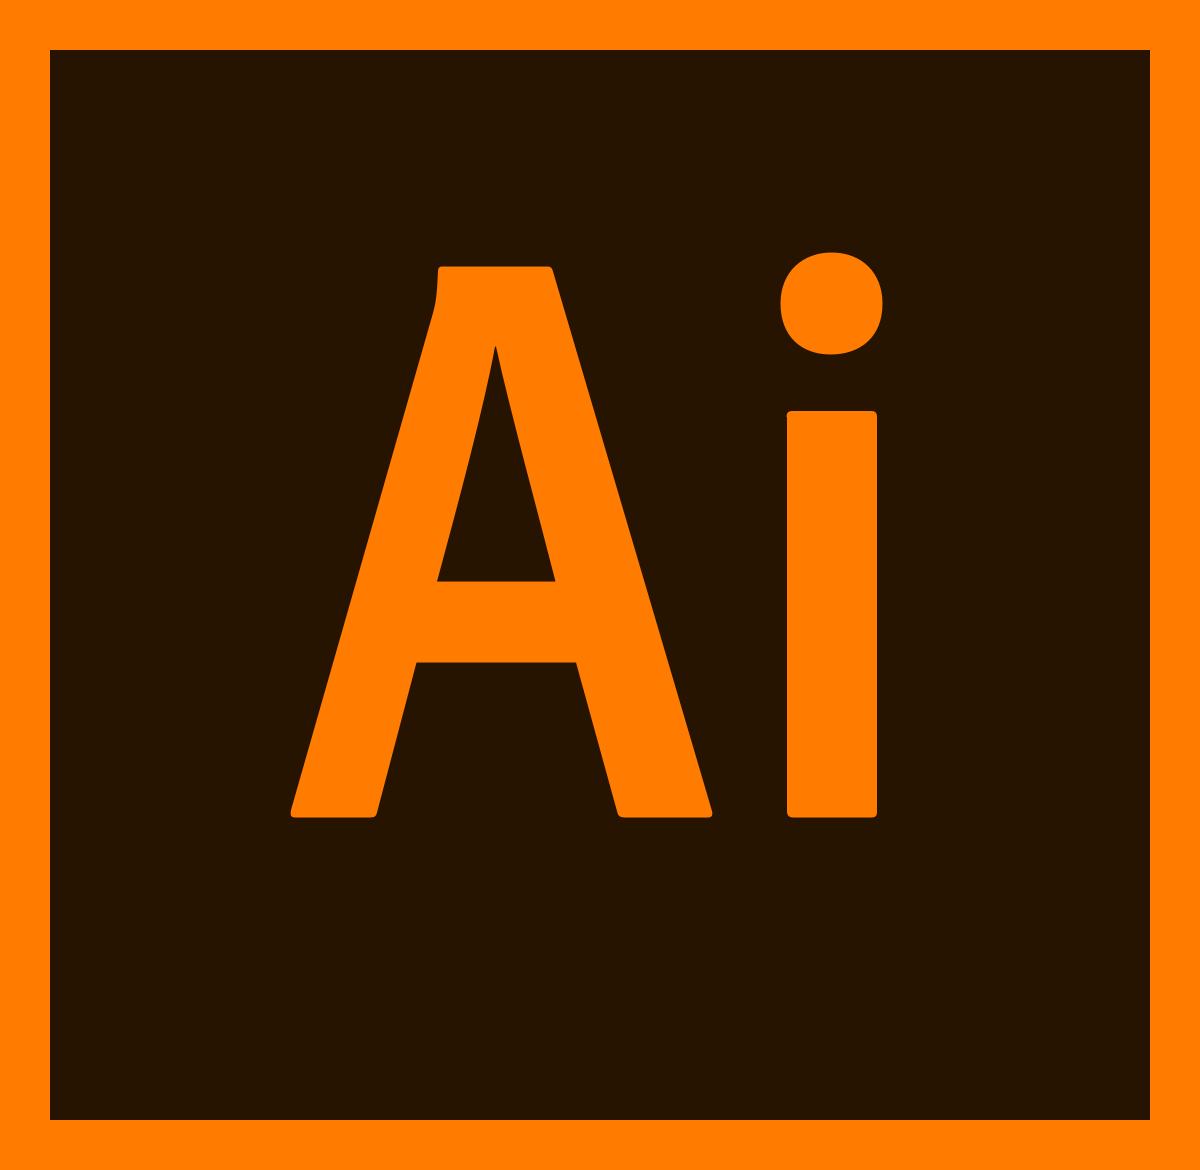 adobe Illustrator CC 2019 full crack torrent download